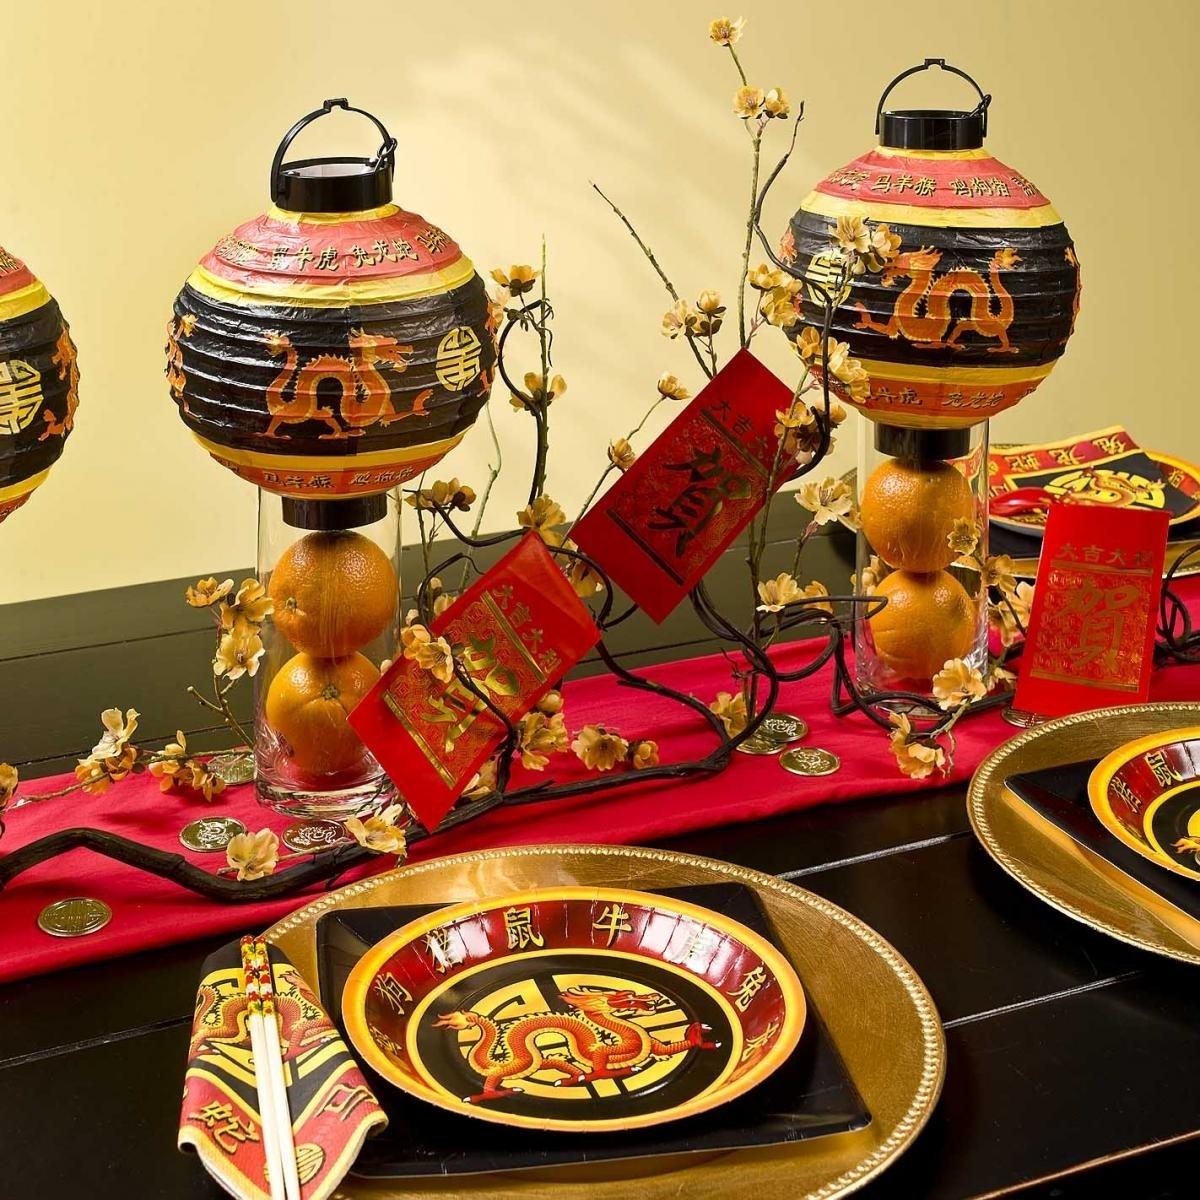 10 Fashionable Chinese New Year Celebration Ideas celebrate chinese new year with diy table decorating ideas fun 2020